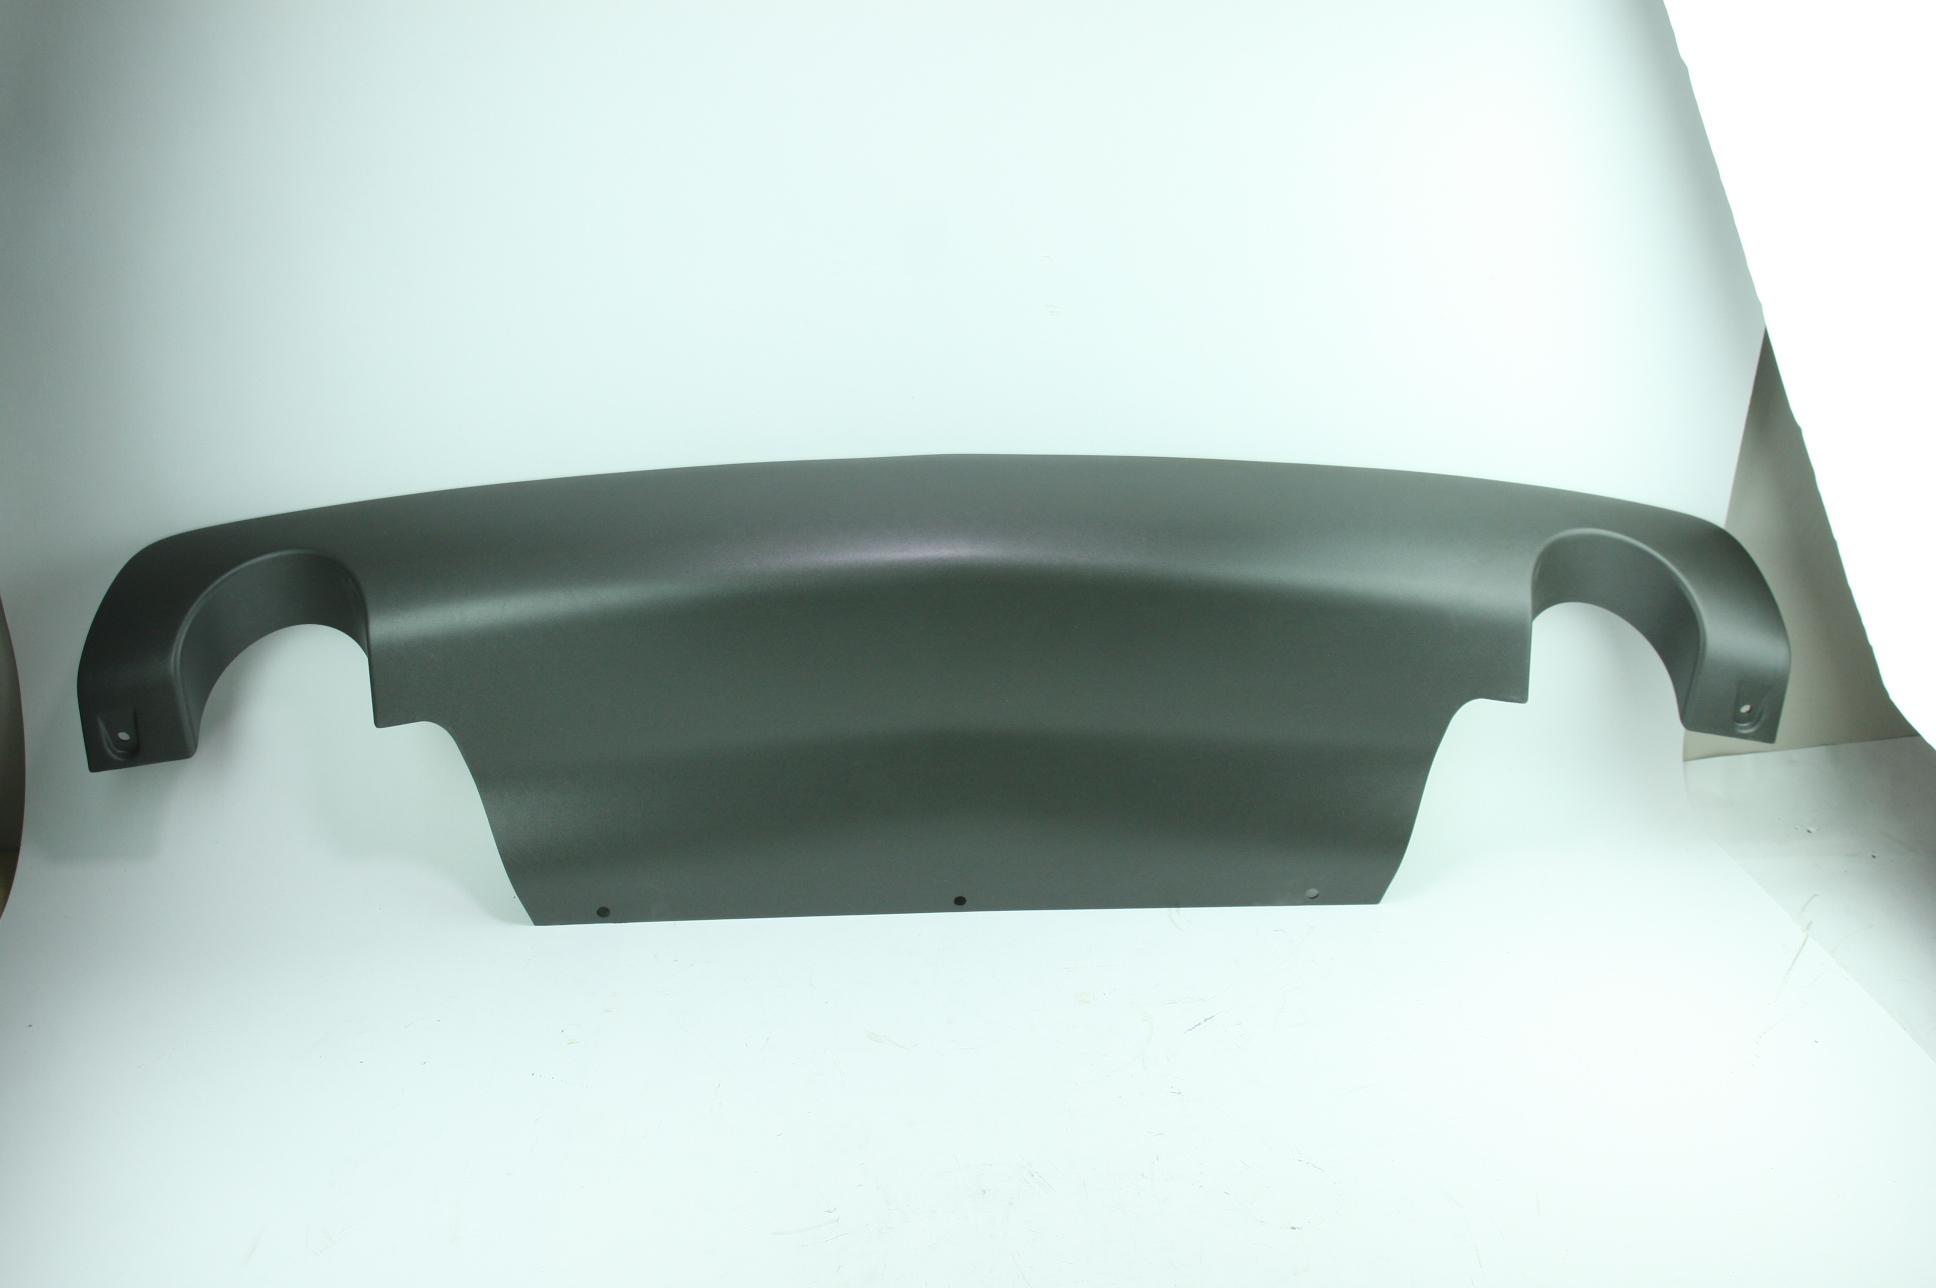 * New Genuine OEM GM 25747970 Cadillac 05-07 STS Rear Bumper Insert Panel NIP - image 1